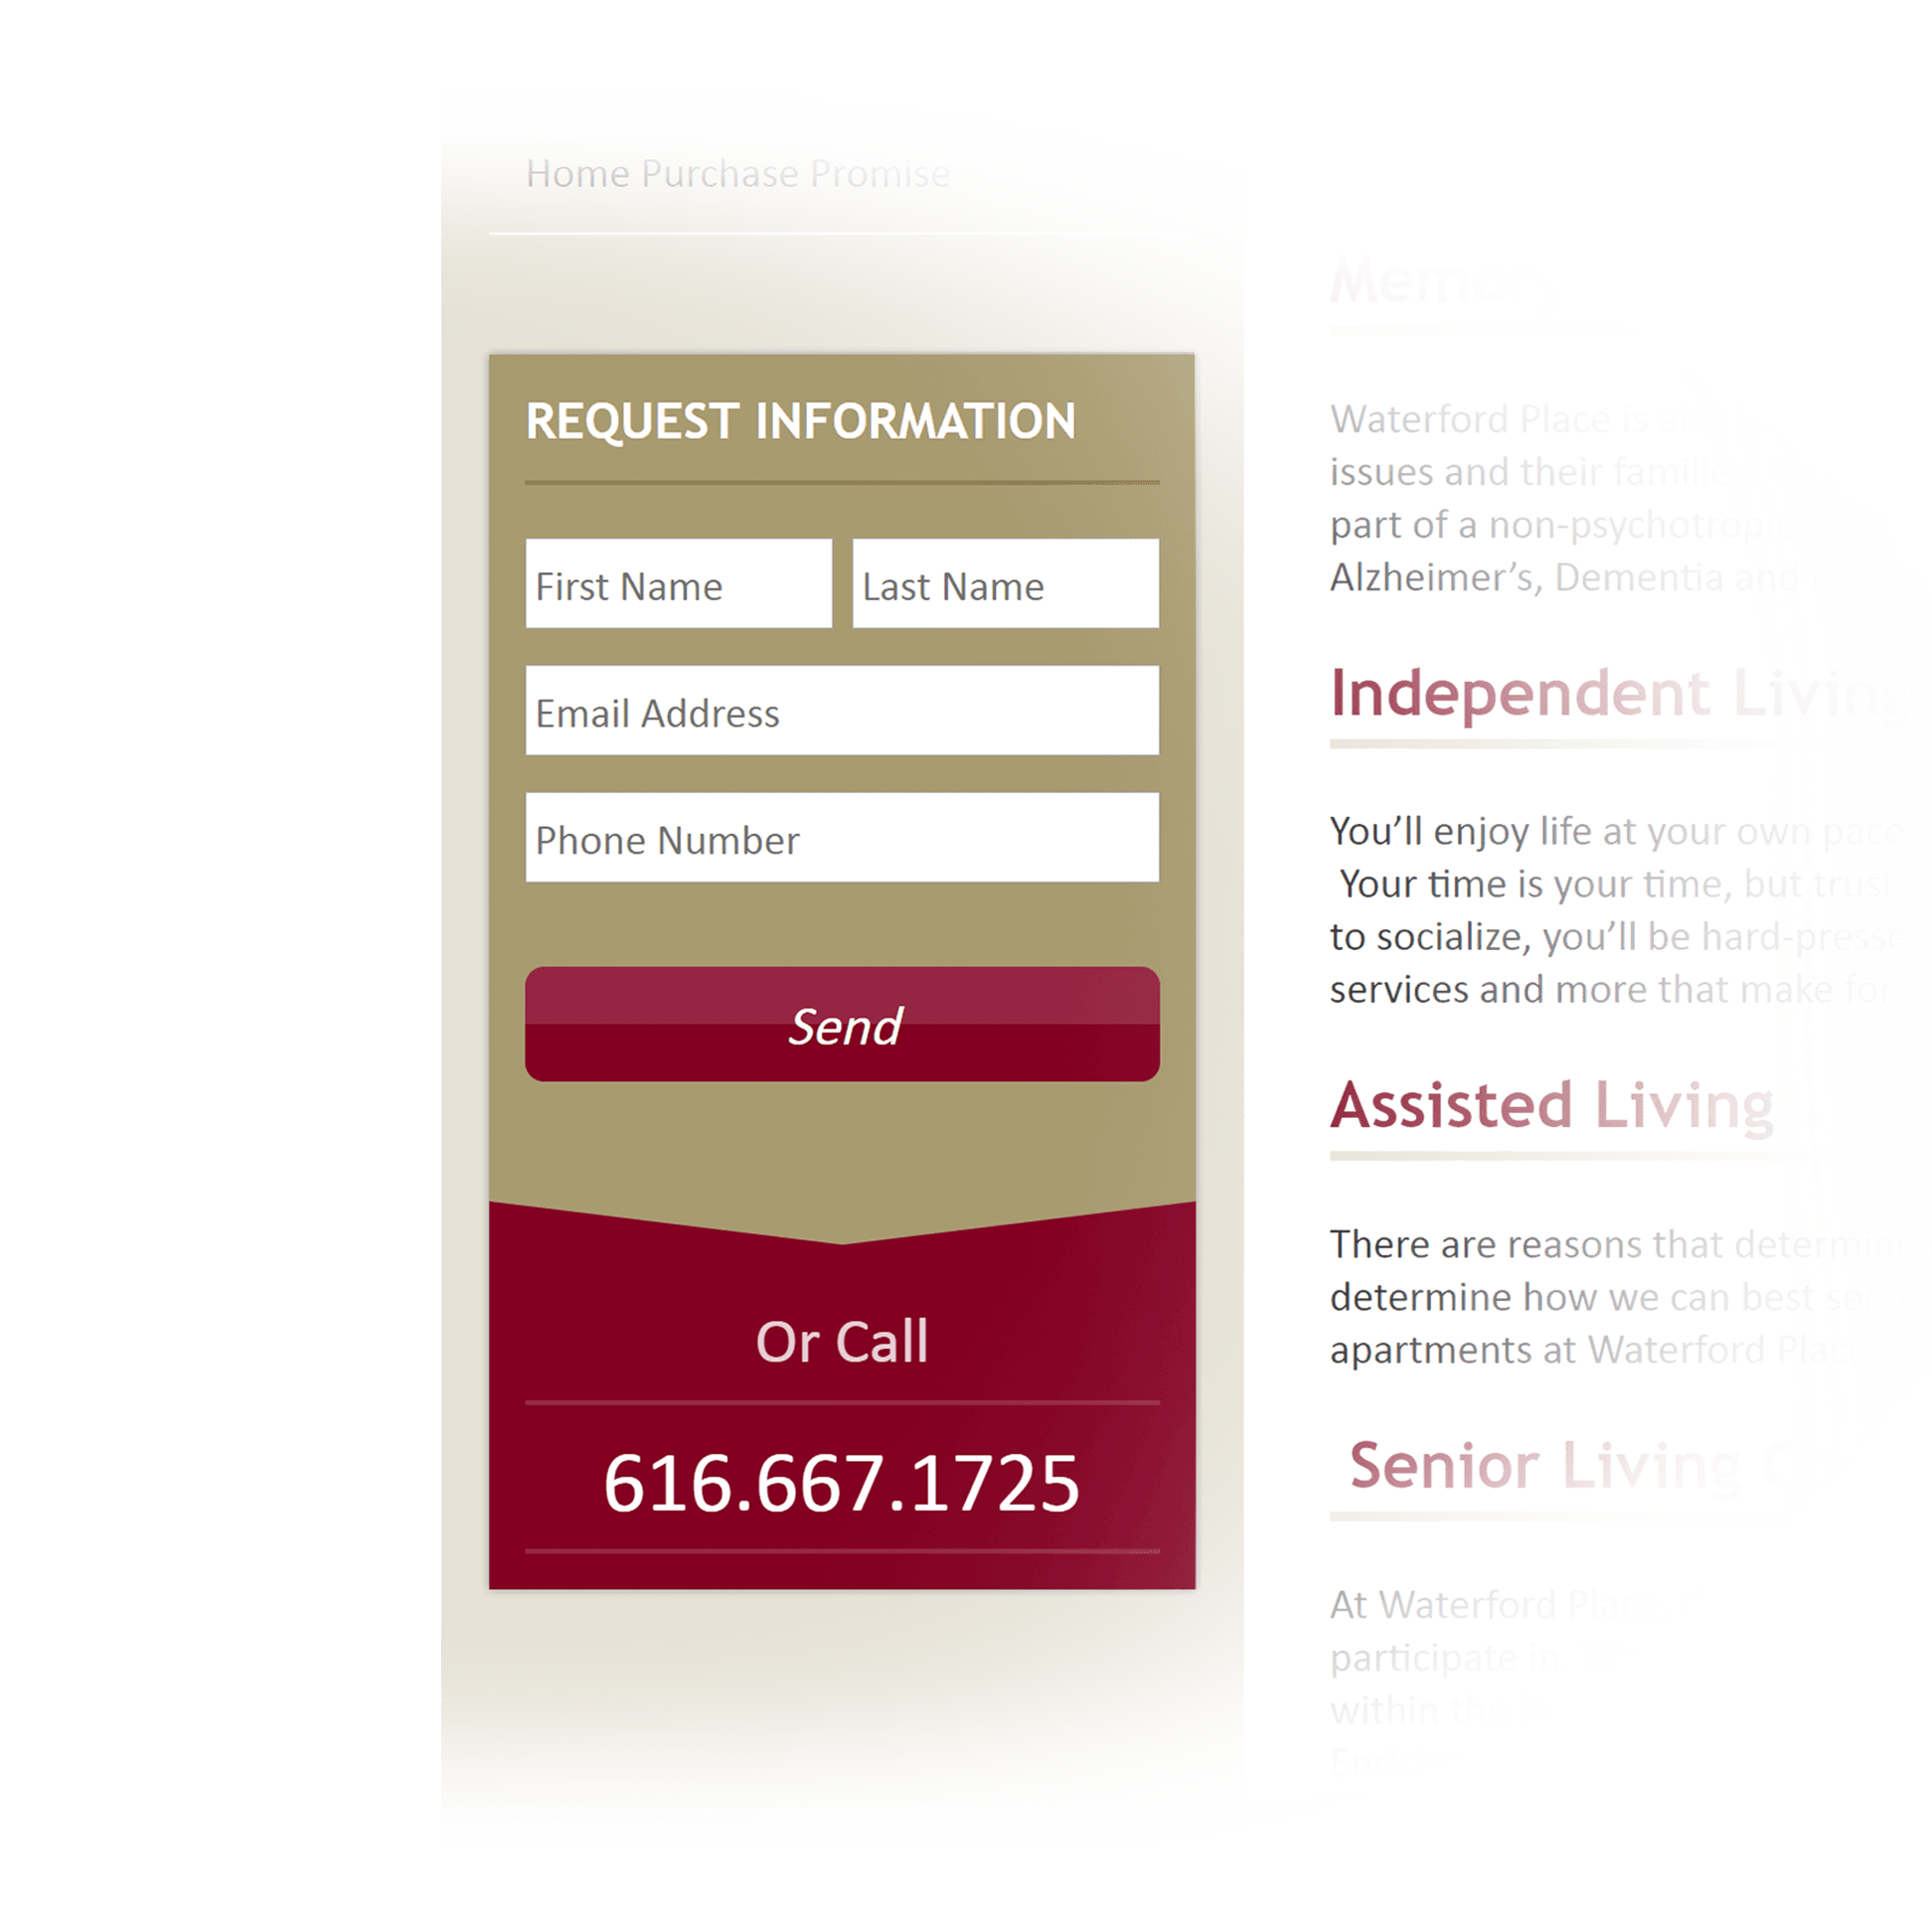 Request Information Form - Sunset Communities